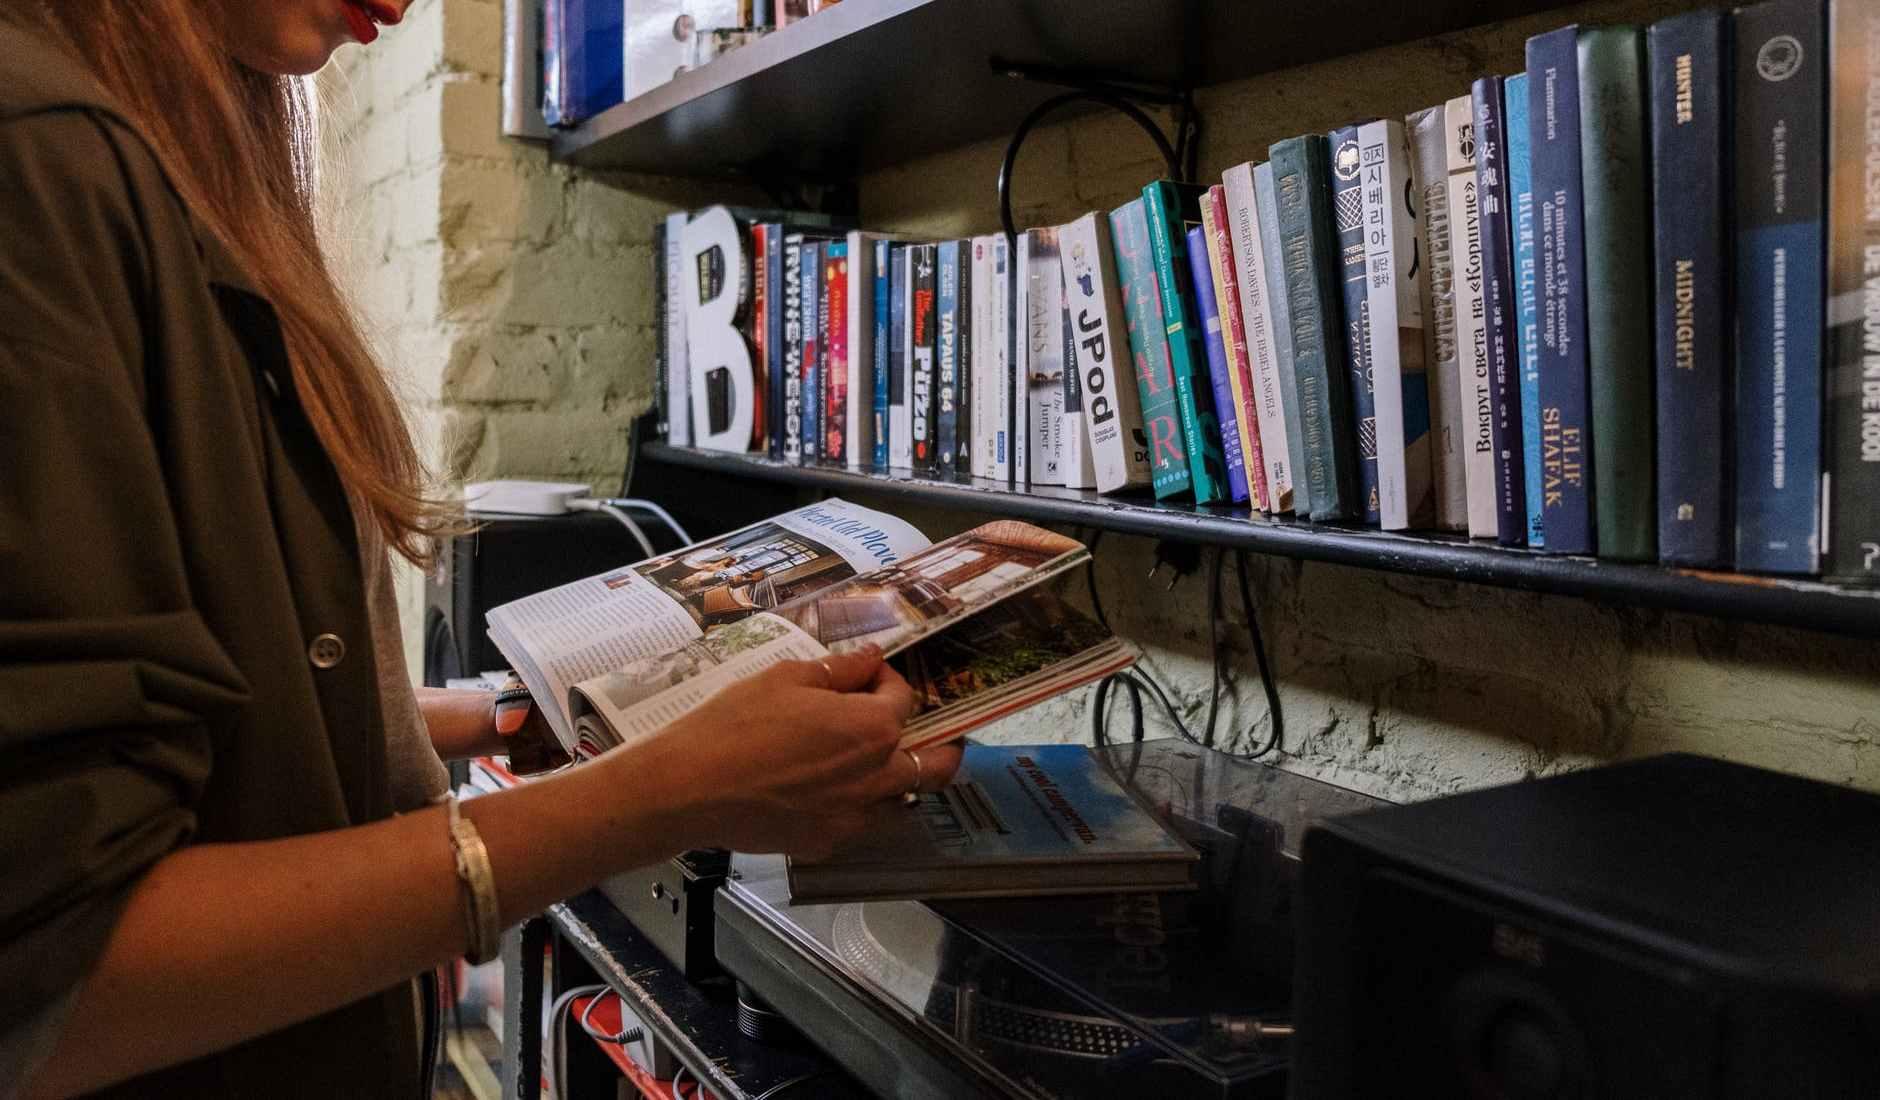 woman in white shirt holding magazine